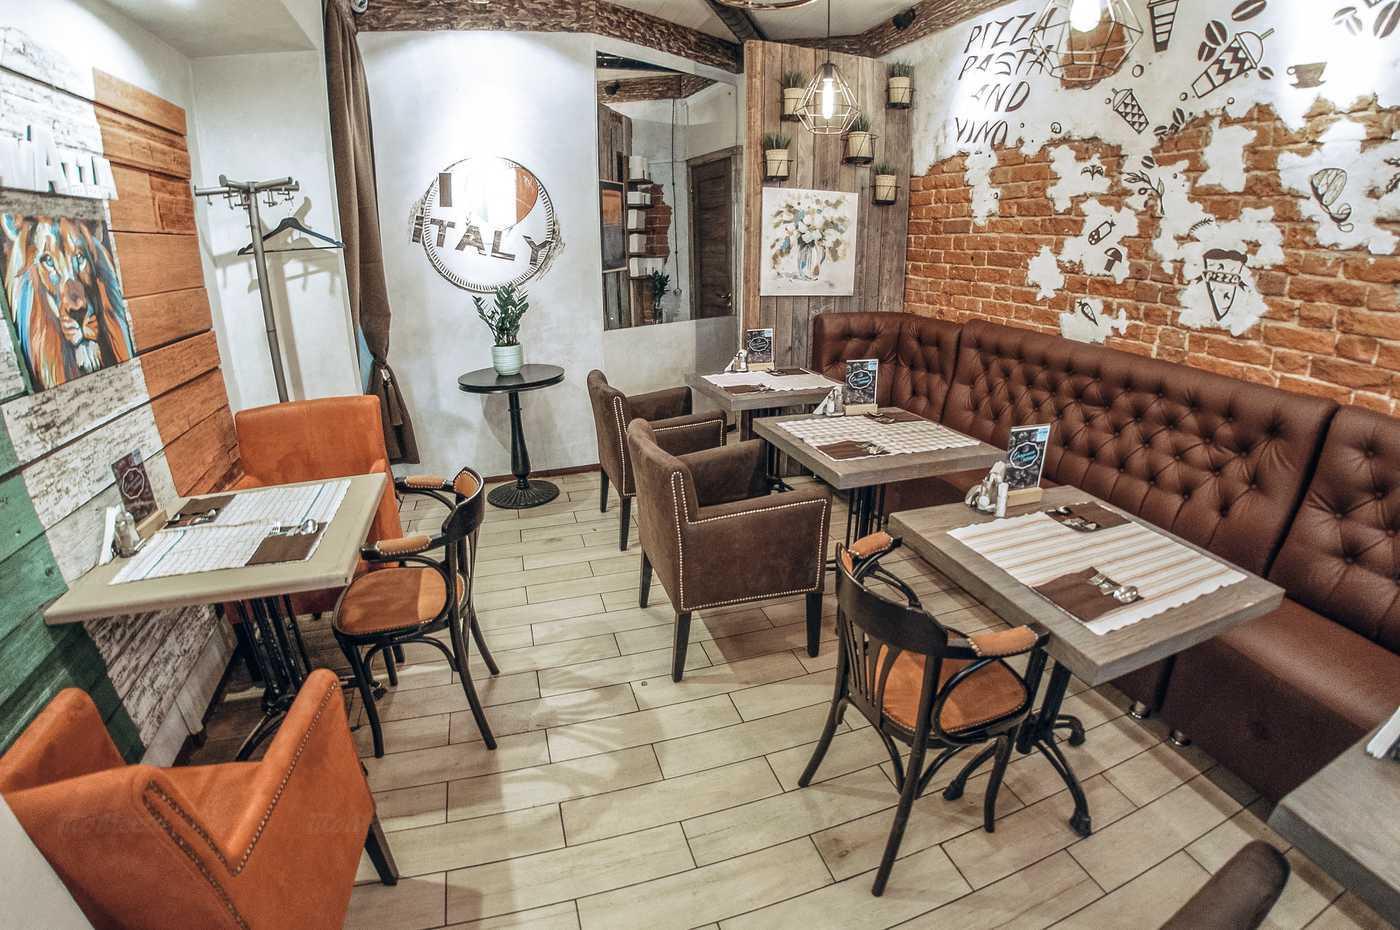 Ресторан Feel Italian на Пятницкой